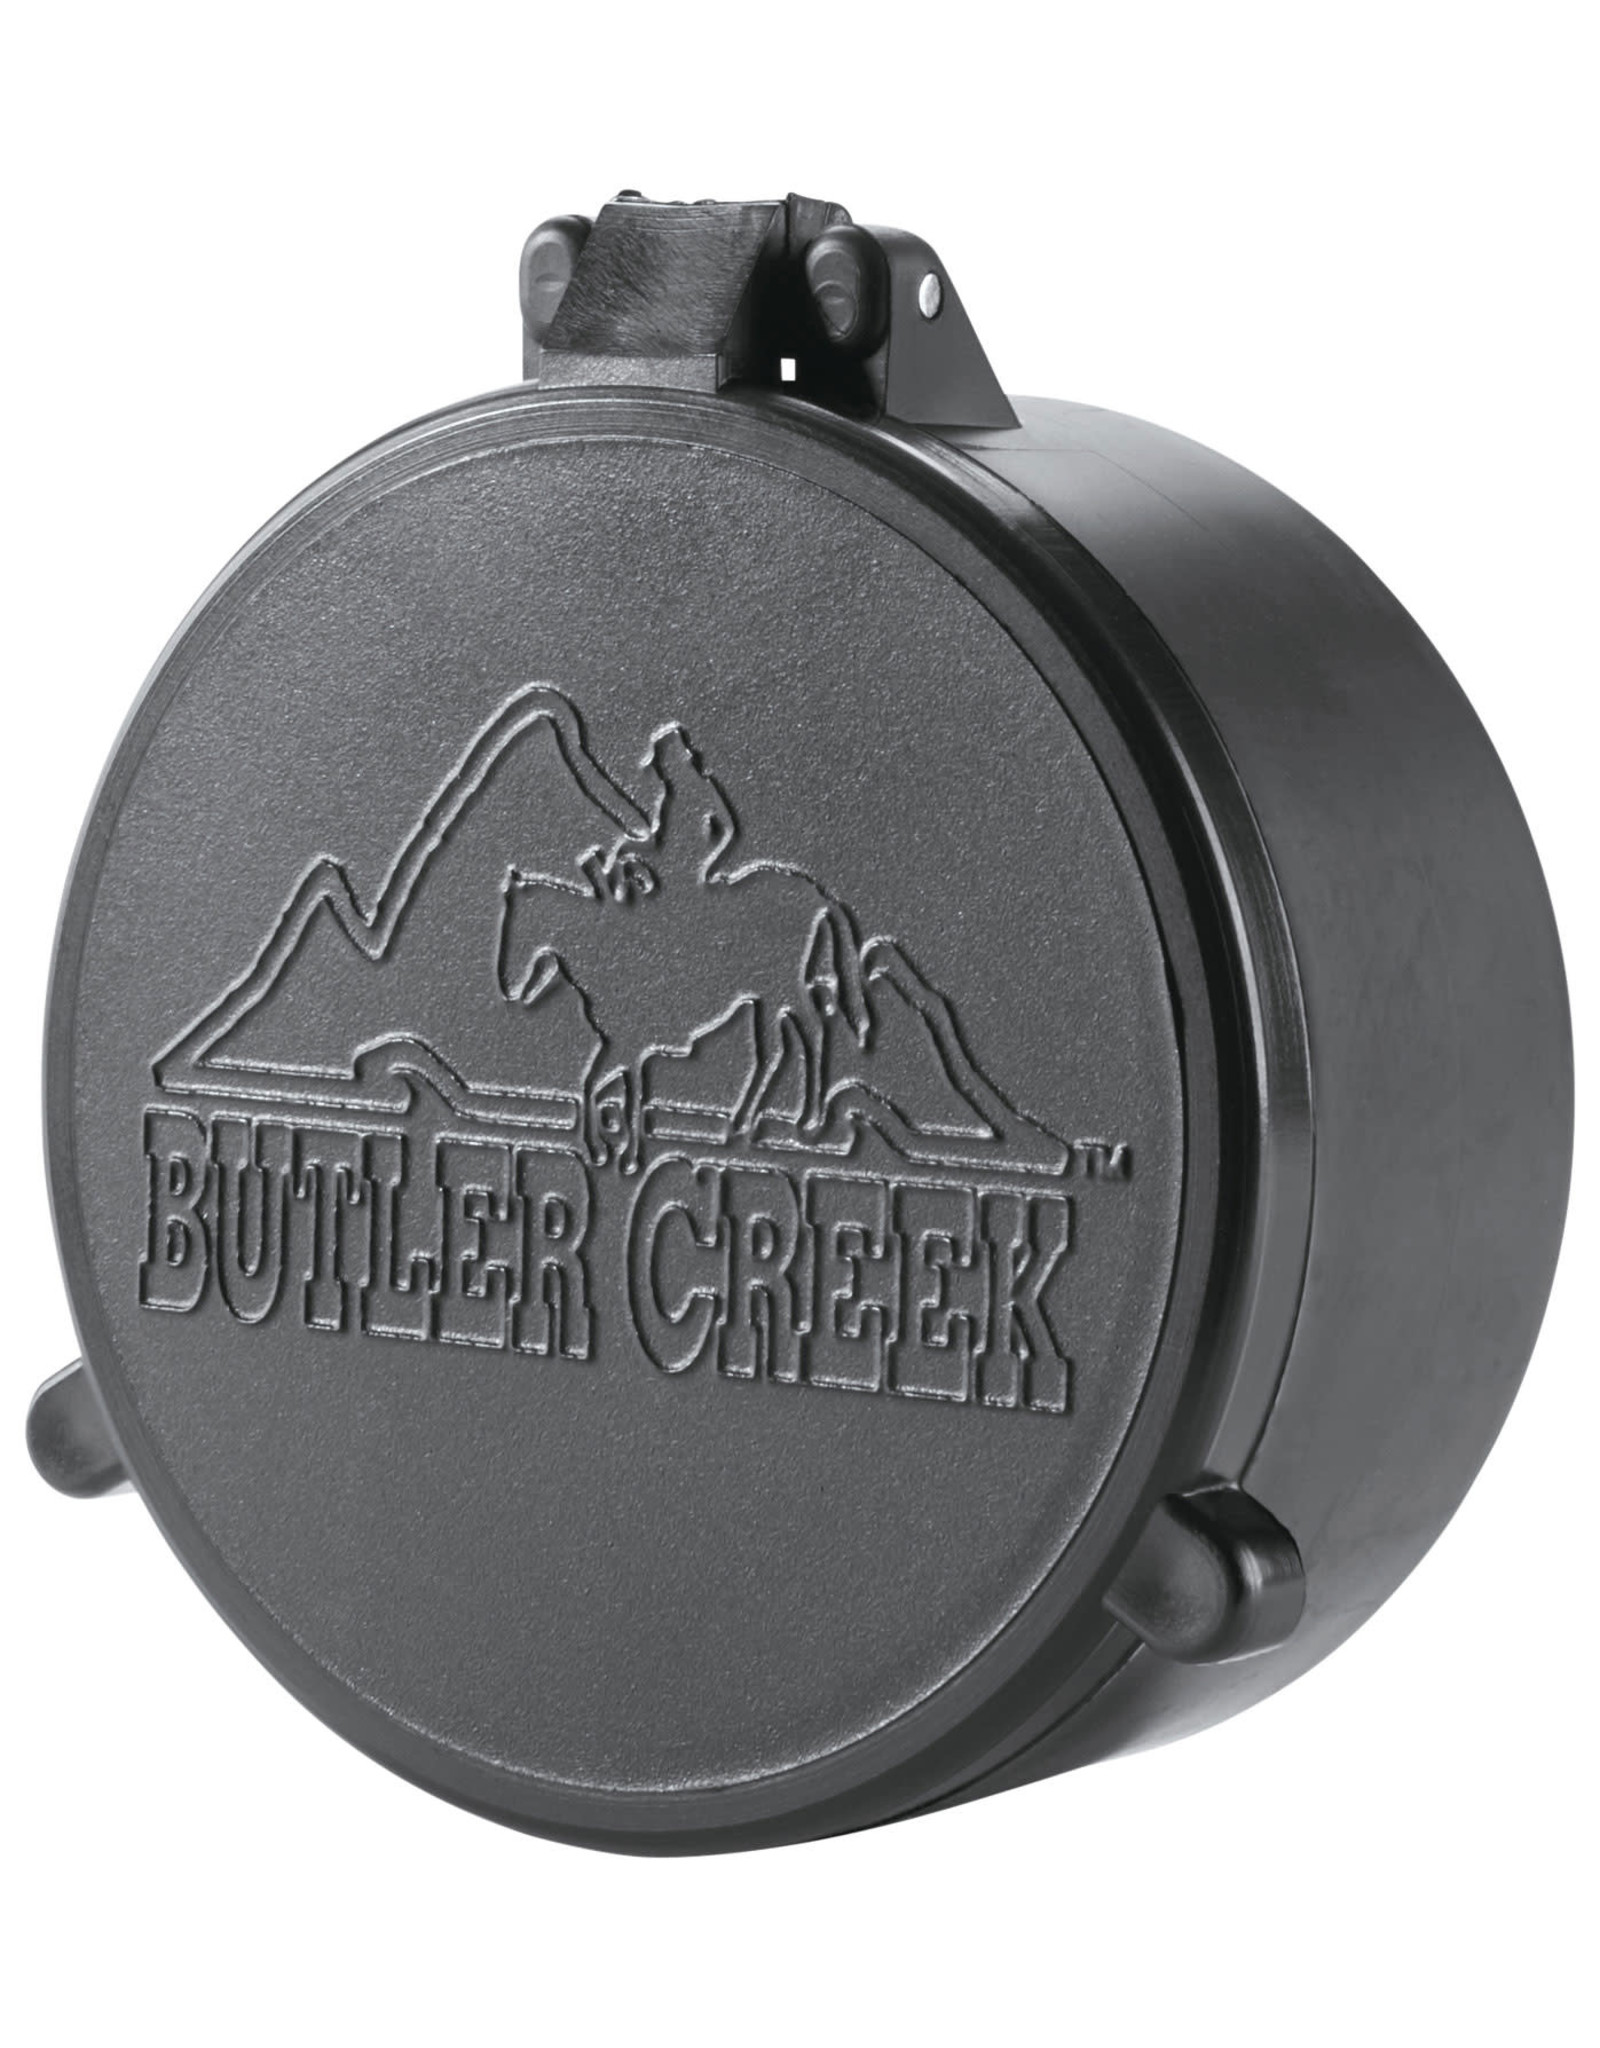 "BUTLER CREEK Butler Creek 30280 Flip-Open Scope 1.890"" (48.0mm) 28 OBJ"